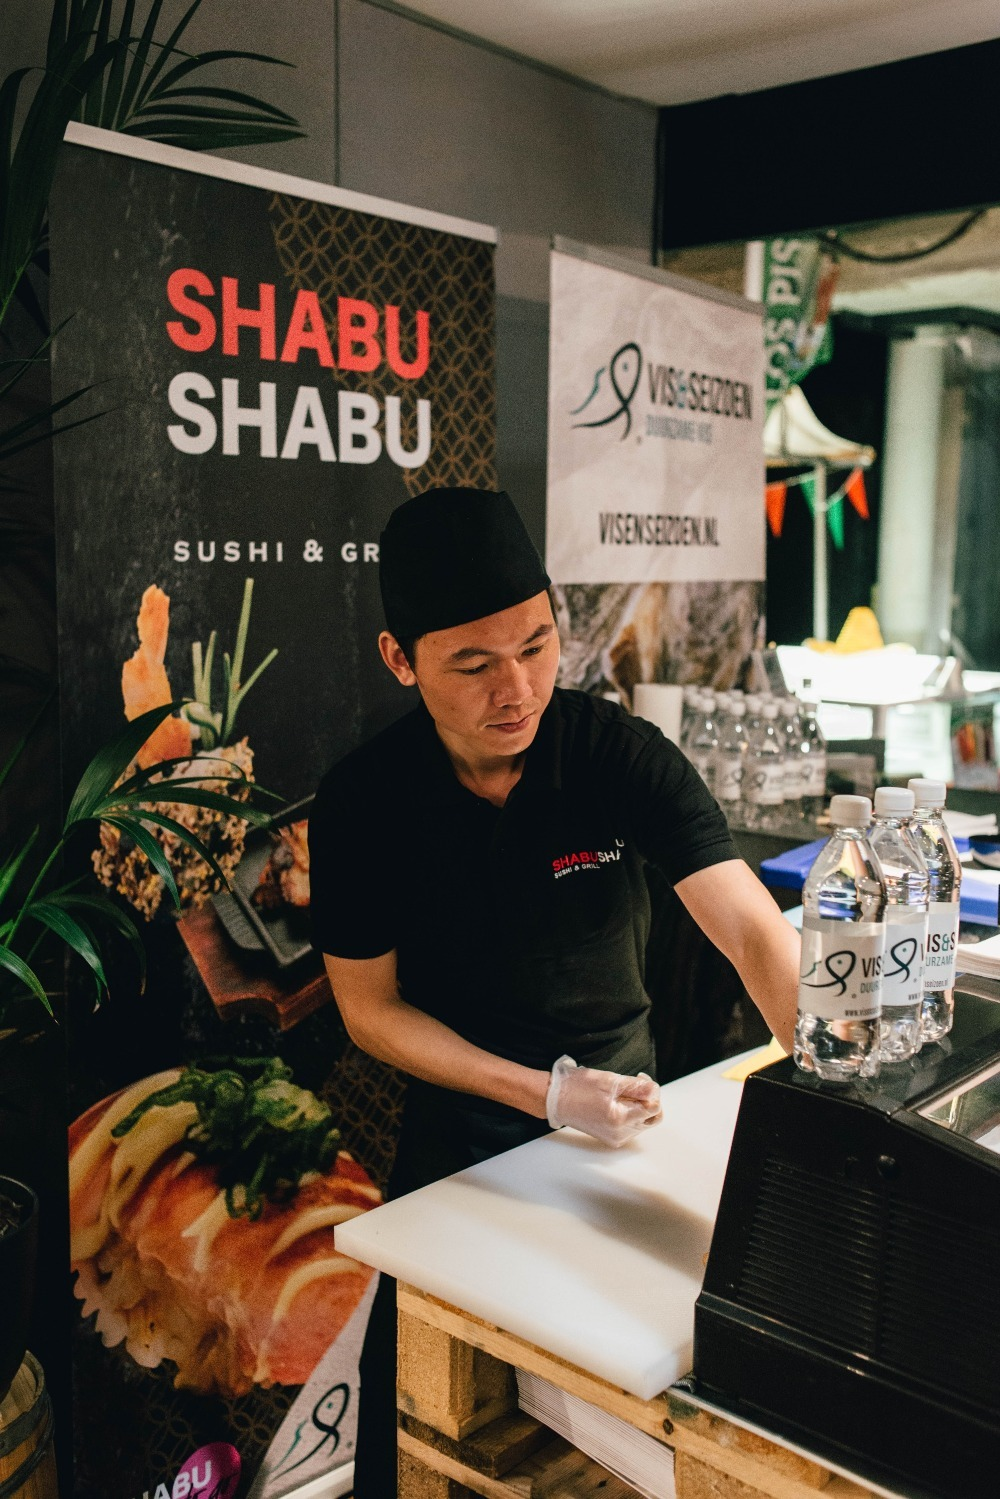 ShabuShabu samen met Vis en Seizoen op Gastvrij Rotterdam